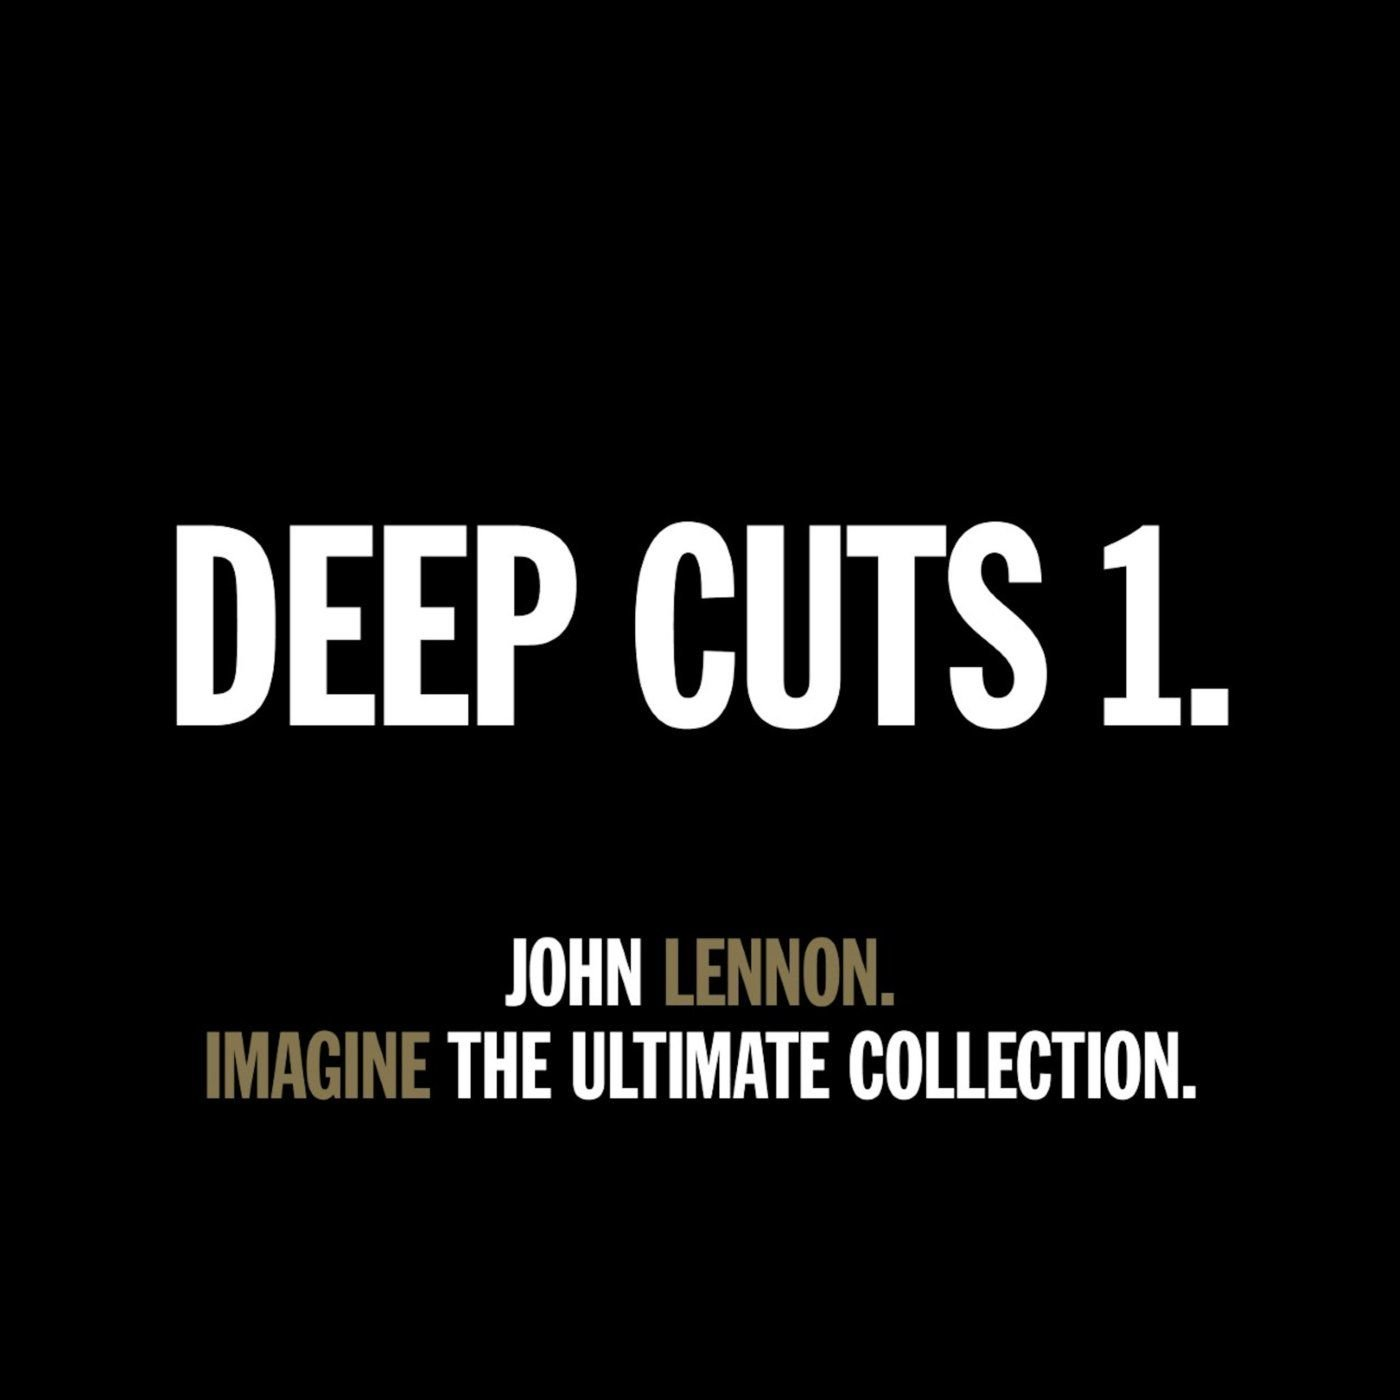 John Lennon - Deep Cuts 1 Imagine The Ultimate Collection (2020) CDSingle